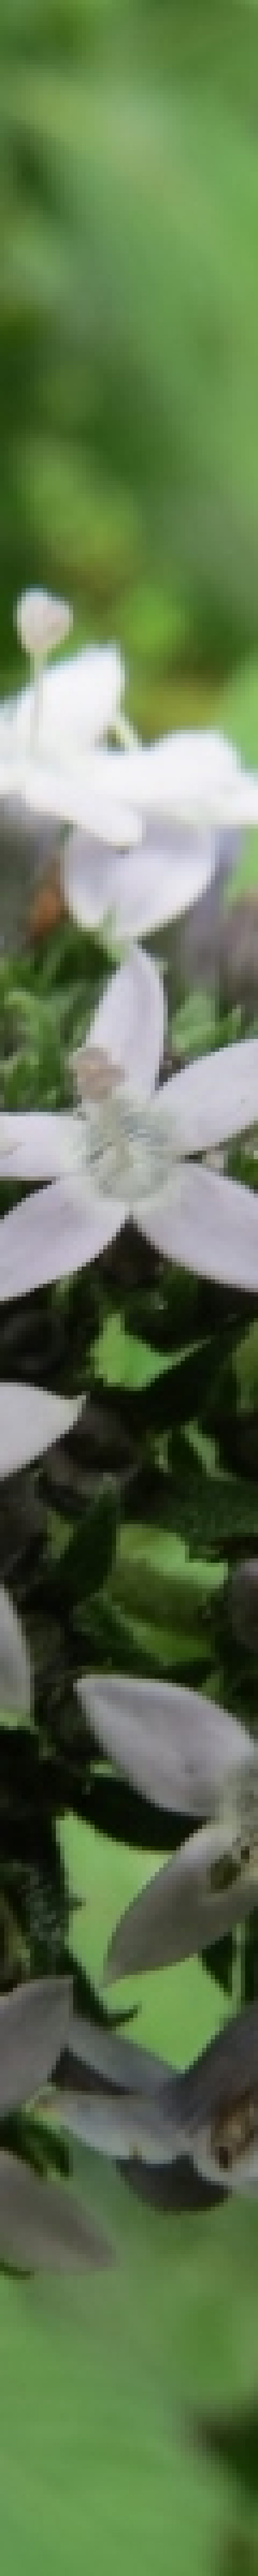 Wild flowers of Vuria in Taita Hills - copyright Rupi Mangat